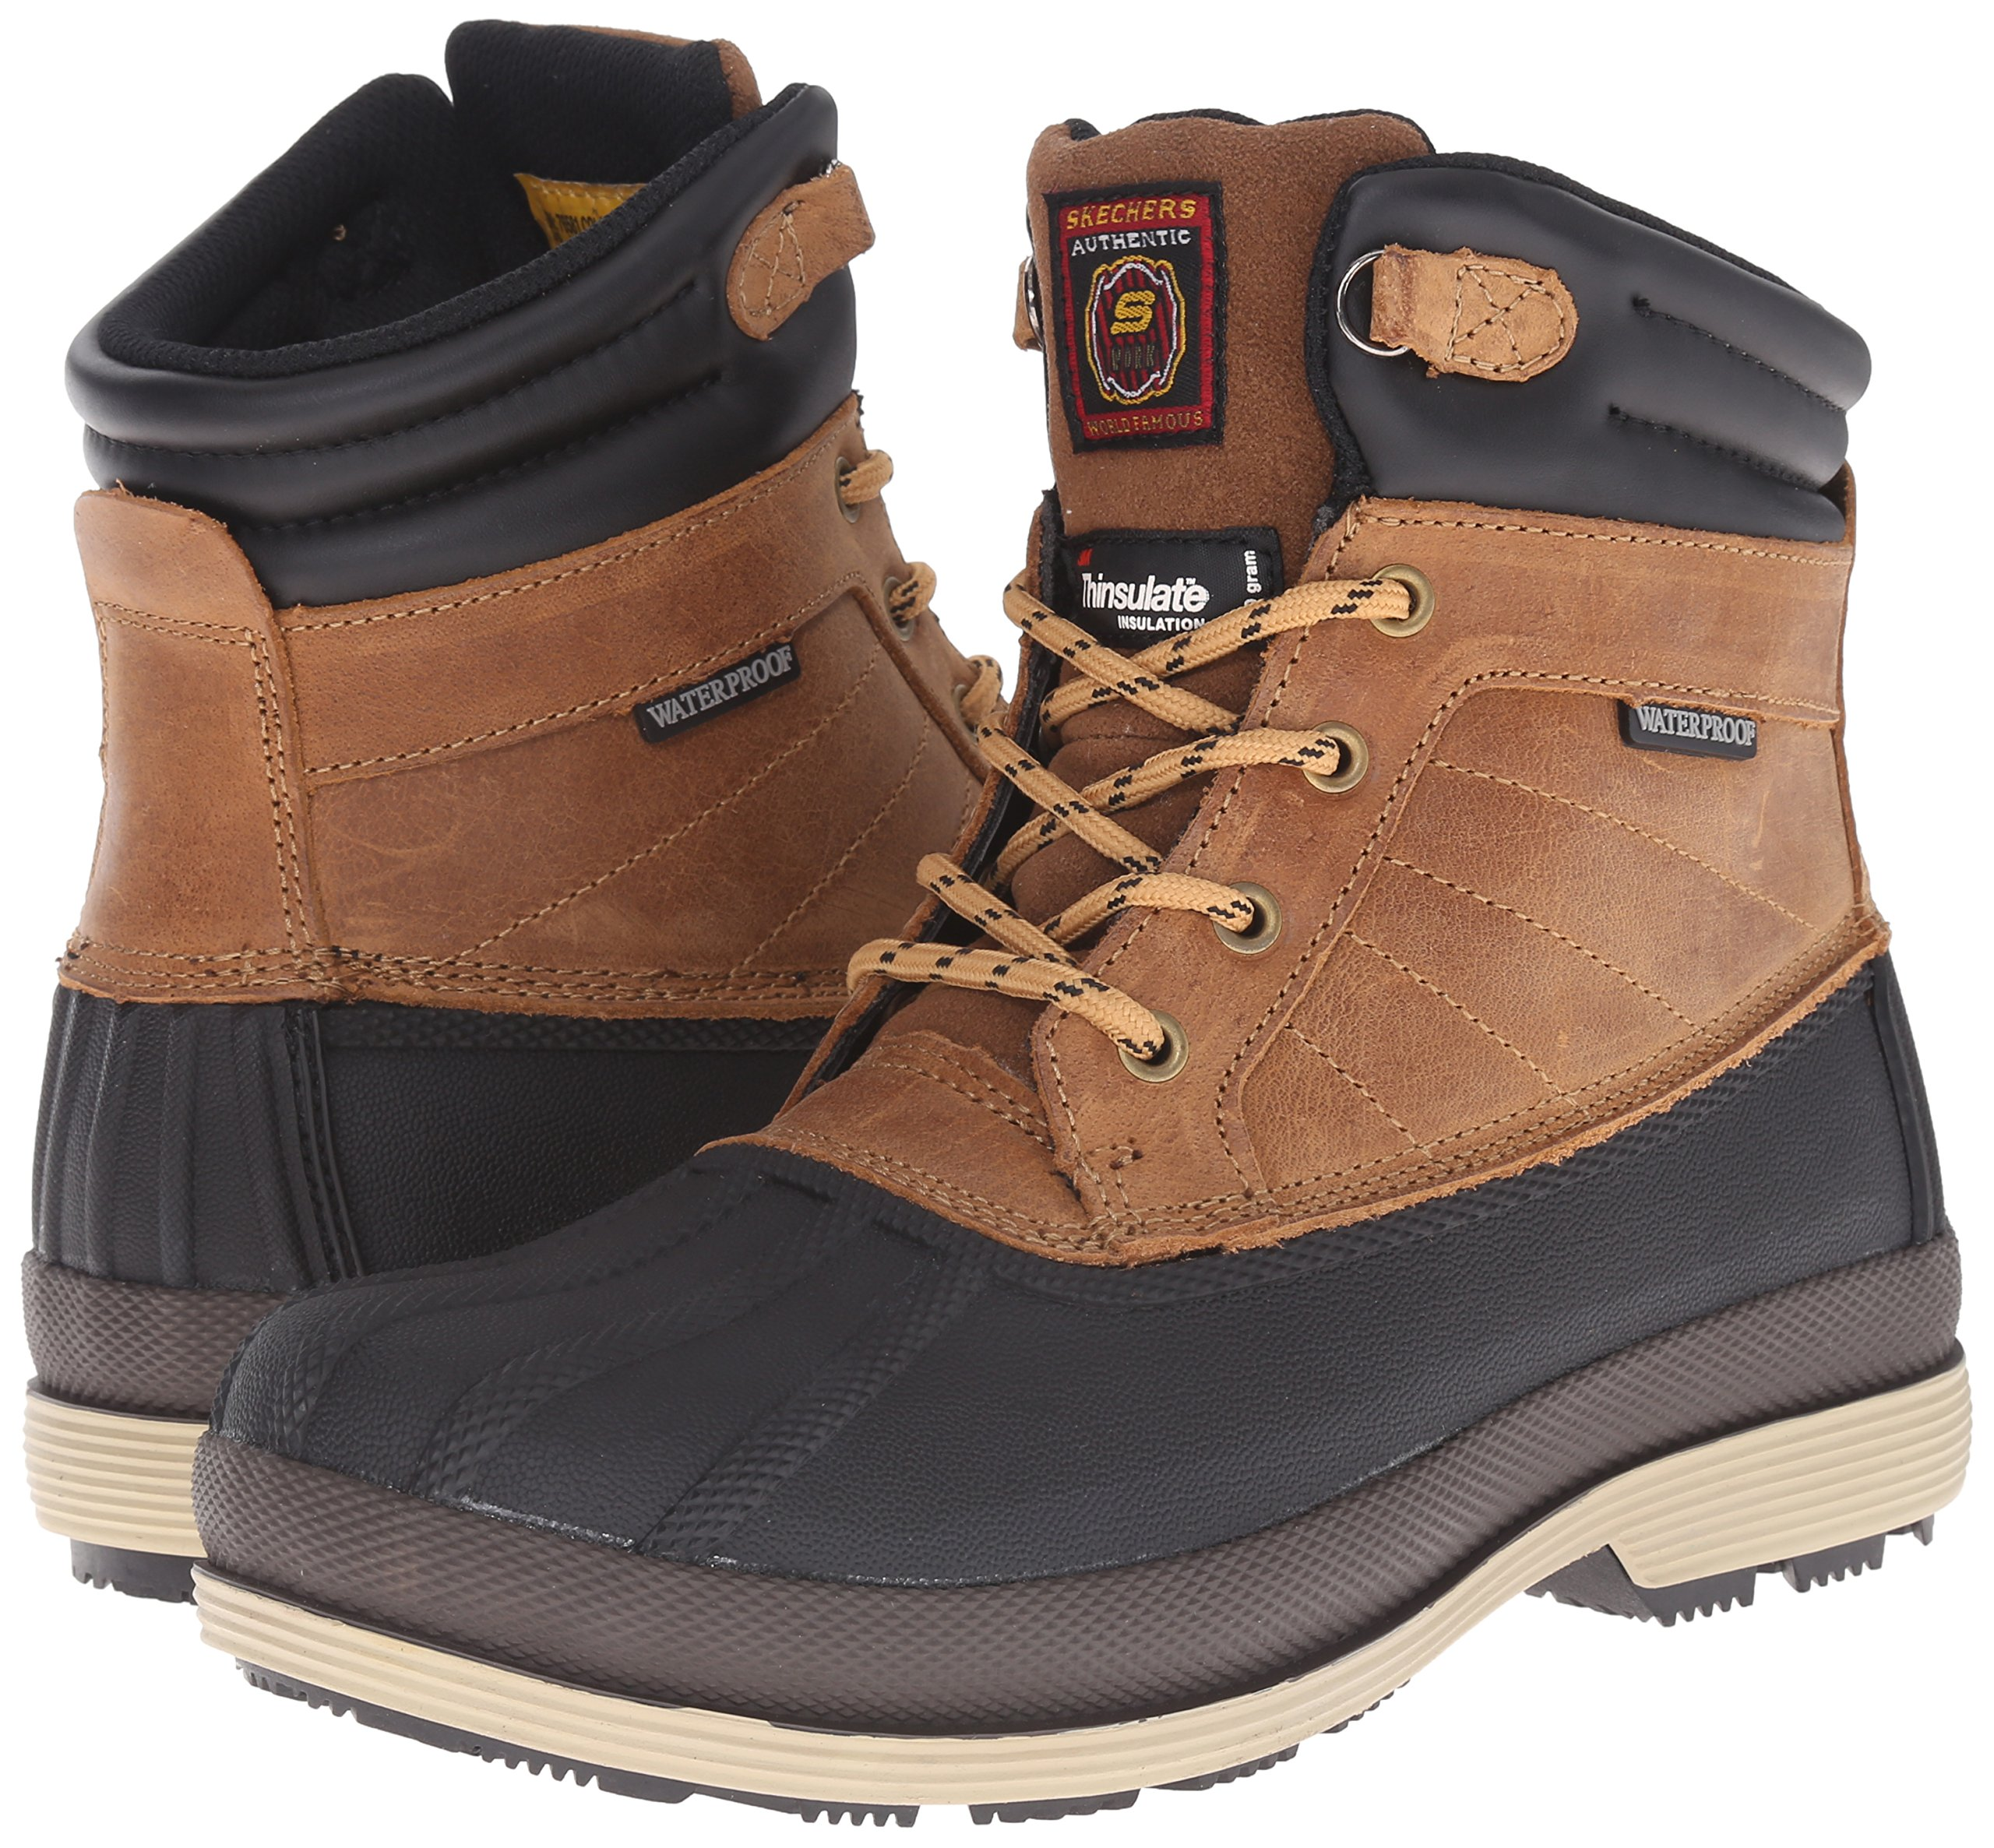 Skechers for Work Women's Duck Rain Boot, Brown, 5.5 M US by Skechers (Image #6)